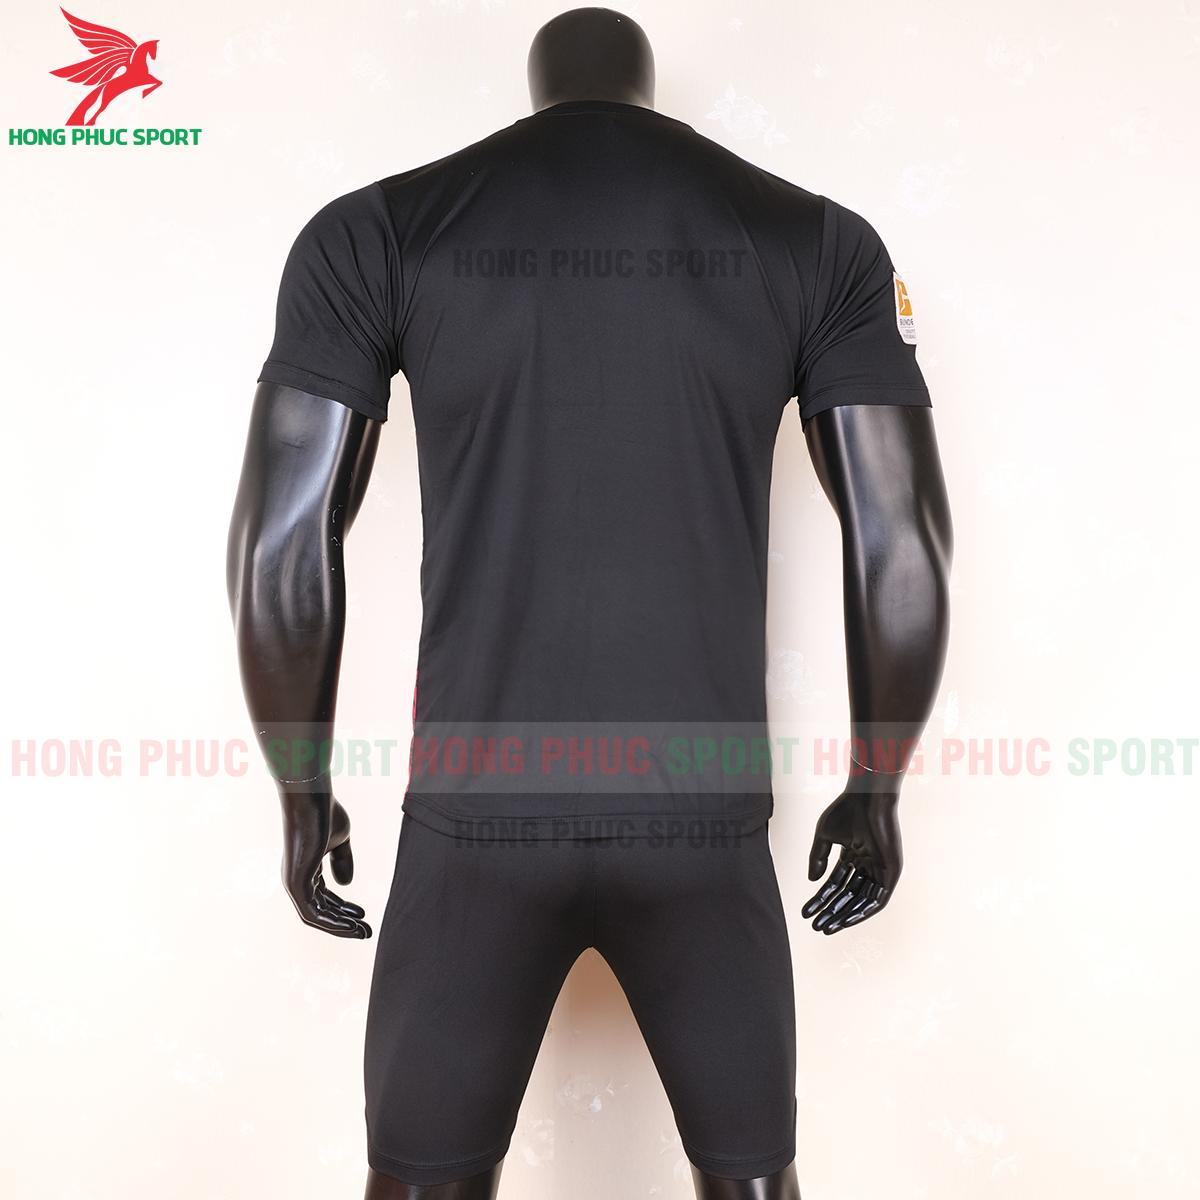 https://cdn.hongphucsport.com/unsafe/s4.shopbay.vn/files/285/ao-bong-da-bayern-munich-2020-2021-mau-thu-3-7-5f6d5d96eb4b3.png